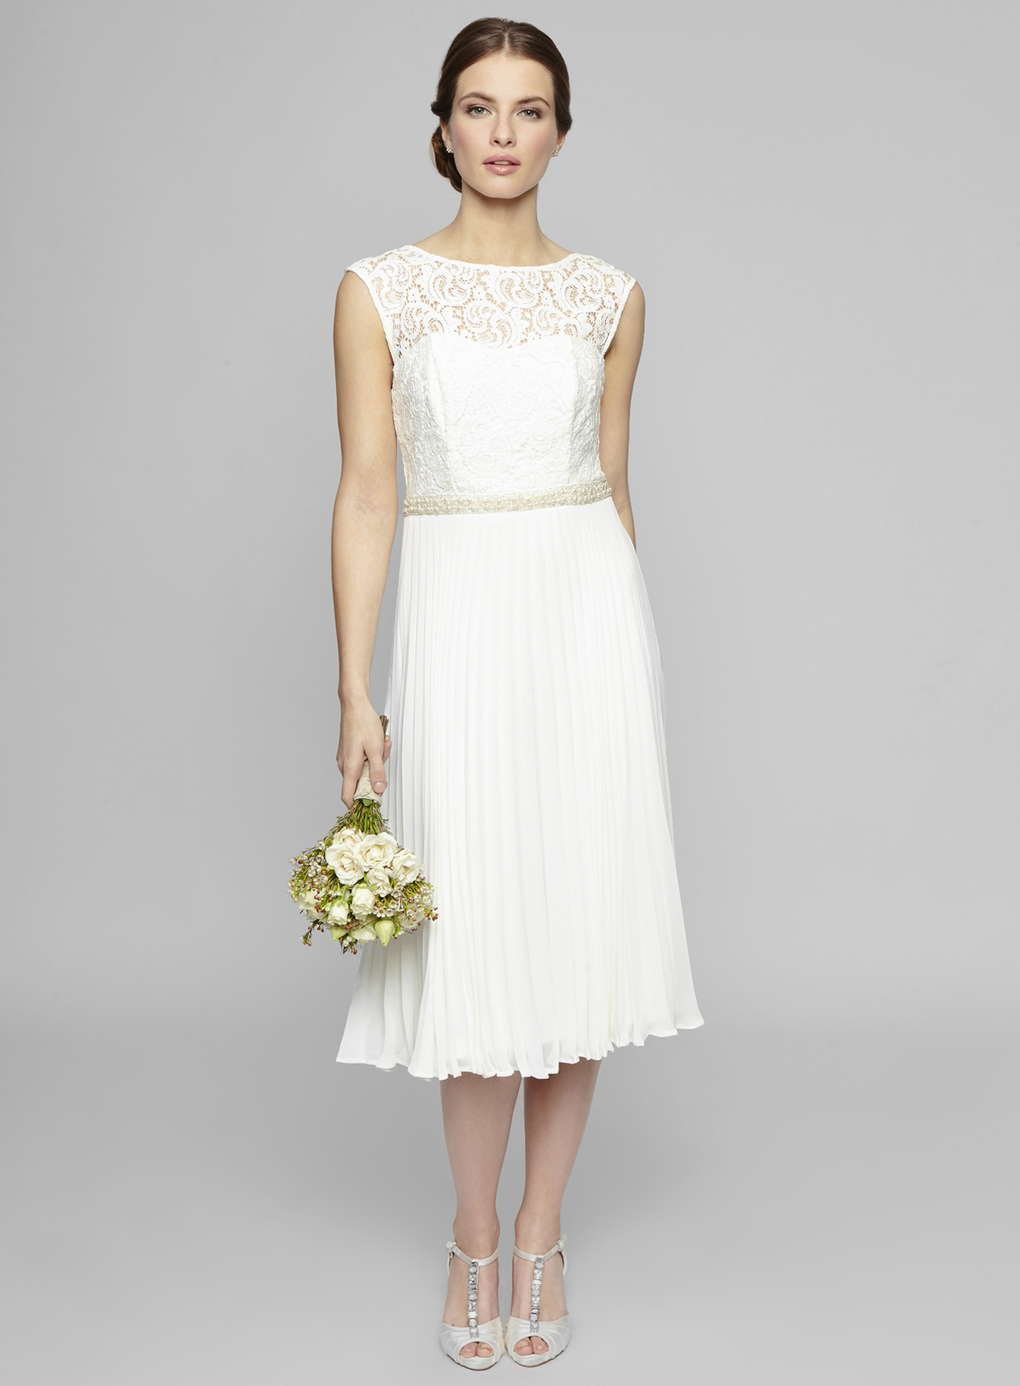 Ivory louisa lace pleat wedding dress httpweddingheart ivory louisa lace pleat wedding dress httpweddingheart ombrellifo Gallery